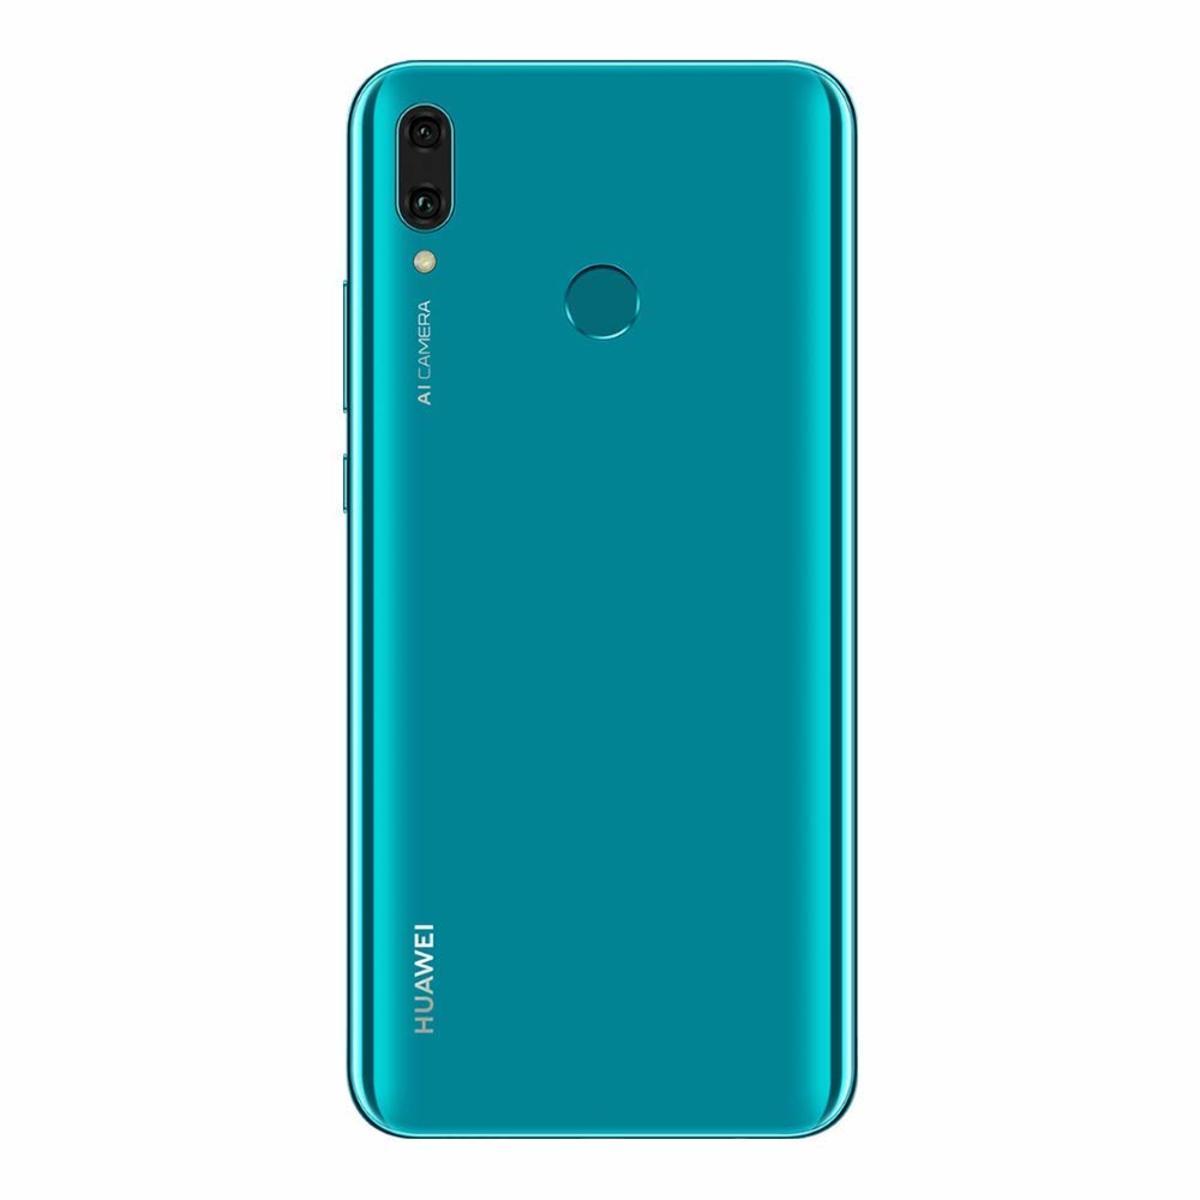 Buy Huawei Y9-2019 128GB Sapphire Blue - TV FESTIVAL - Lulu